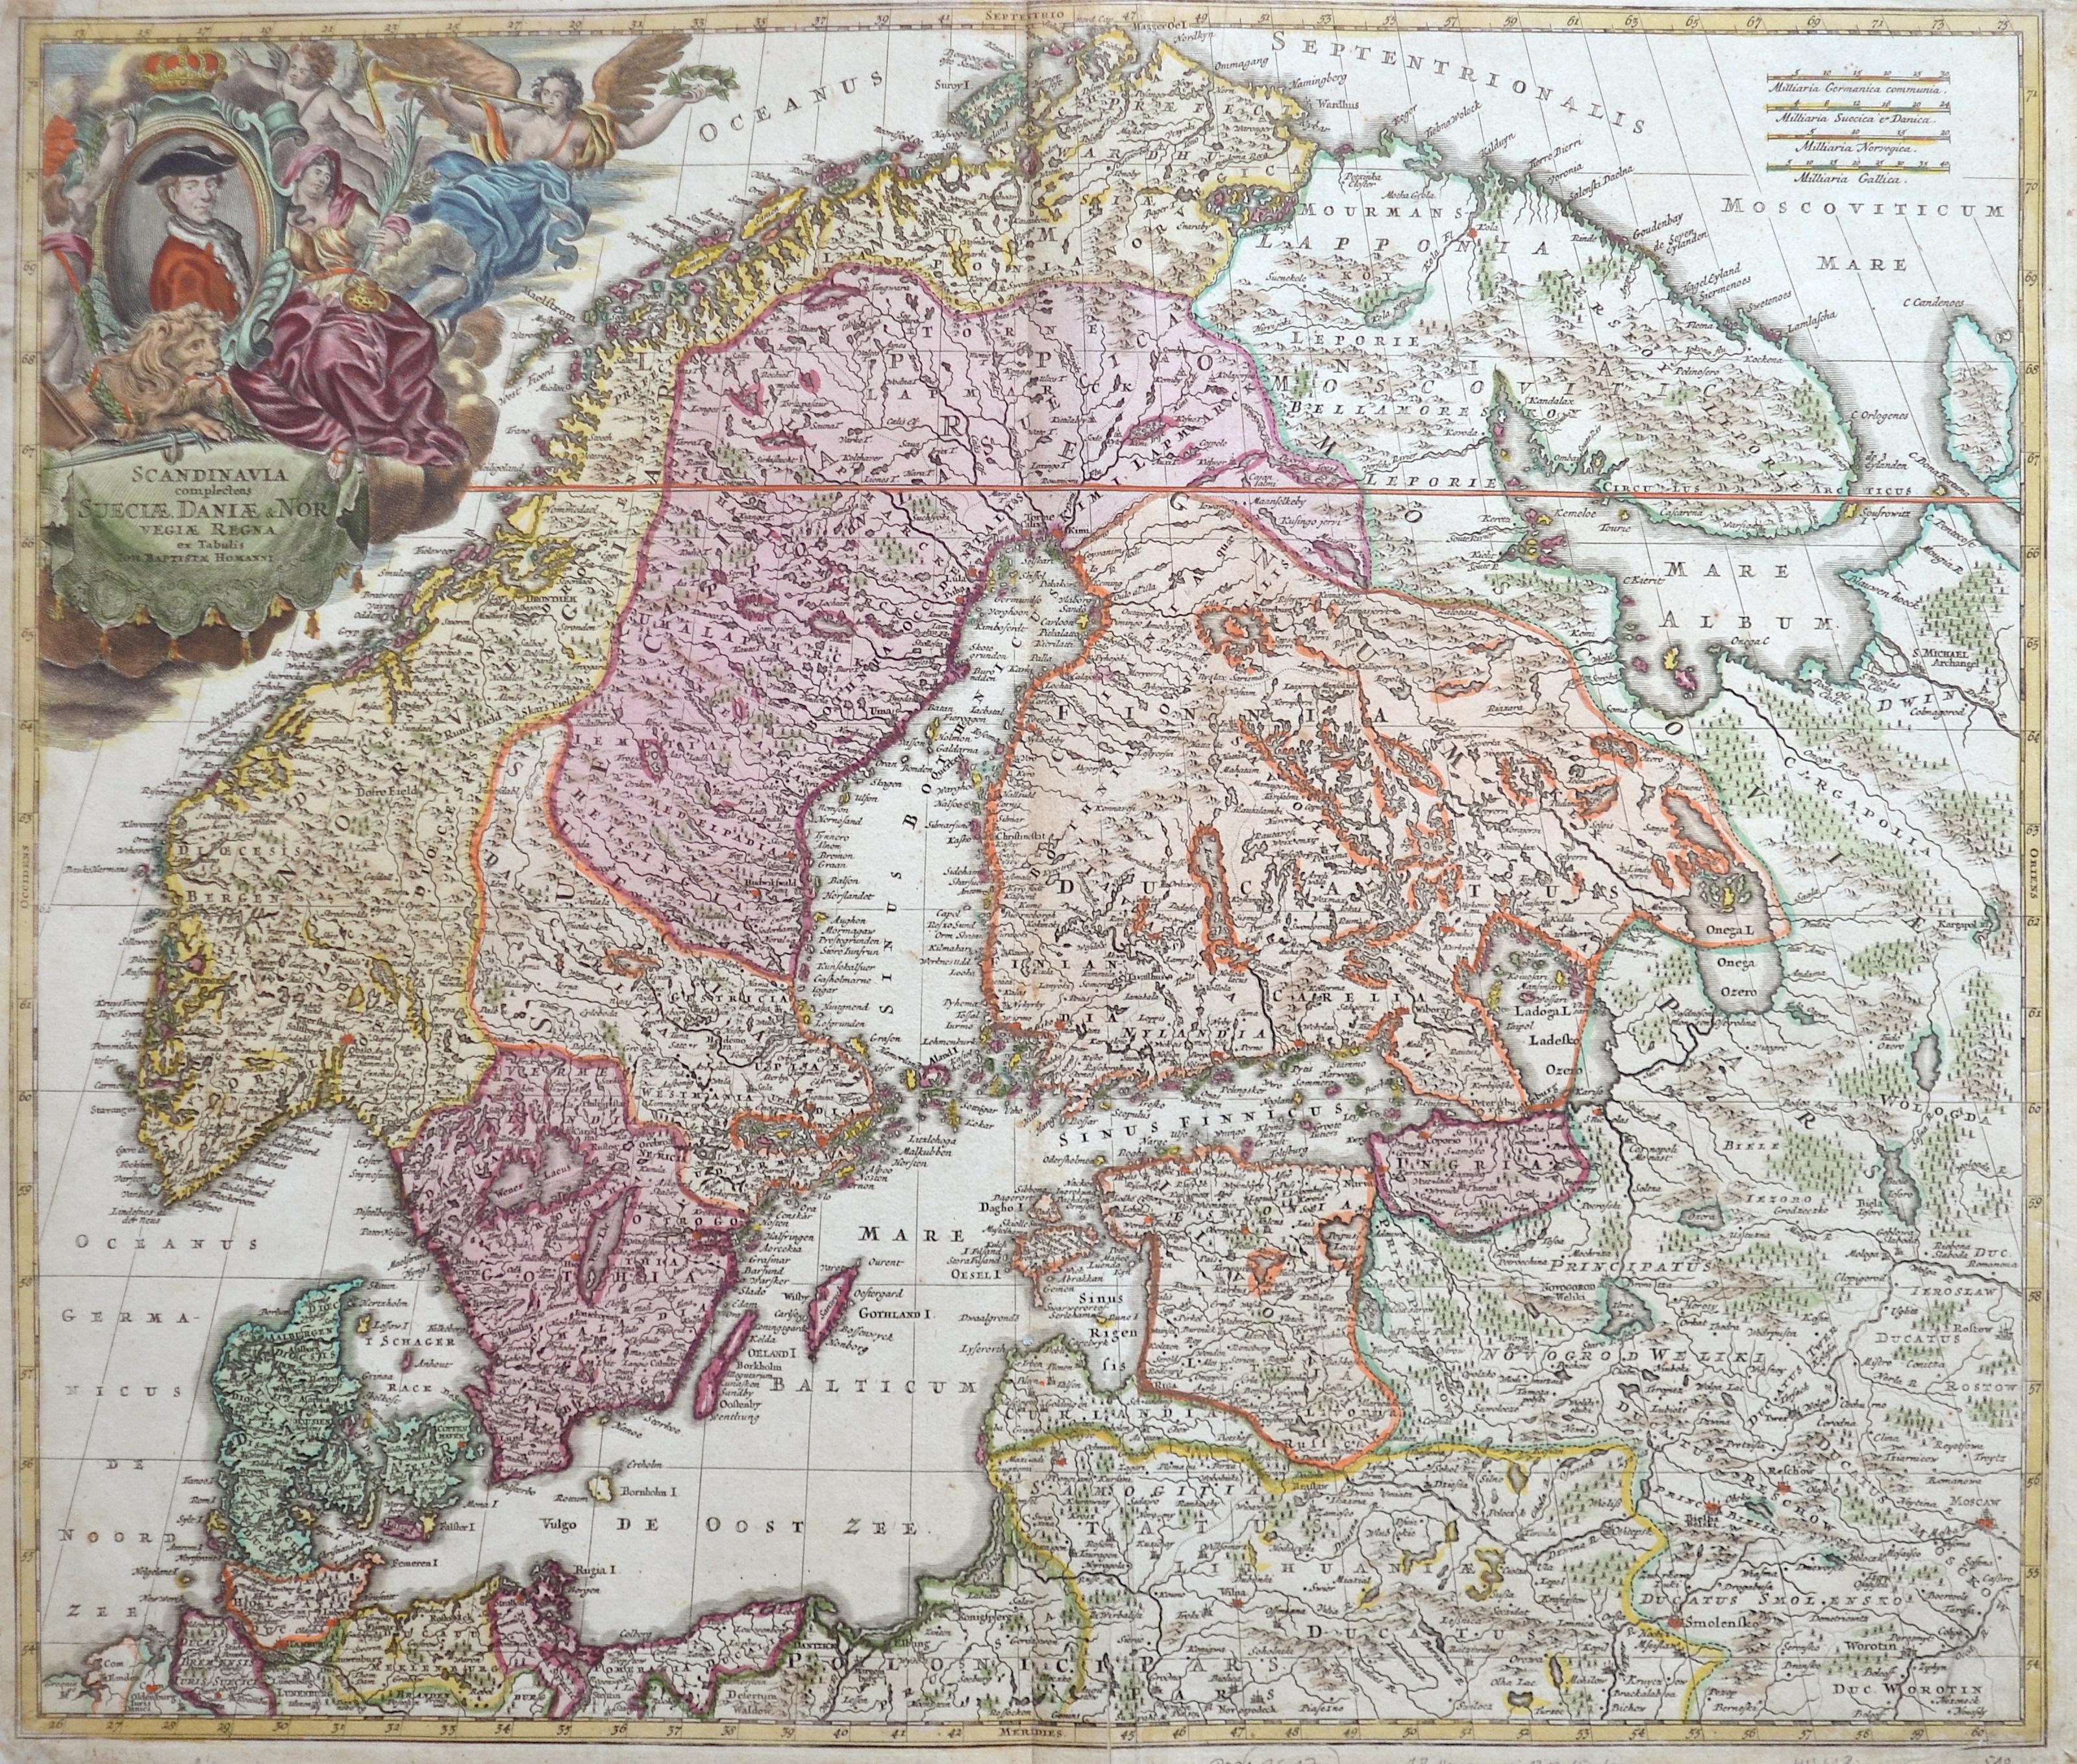 Homann Johann Babtiste Scandinavia complecens Suecie, Daniae & Norvegiae regna ex tabulis